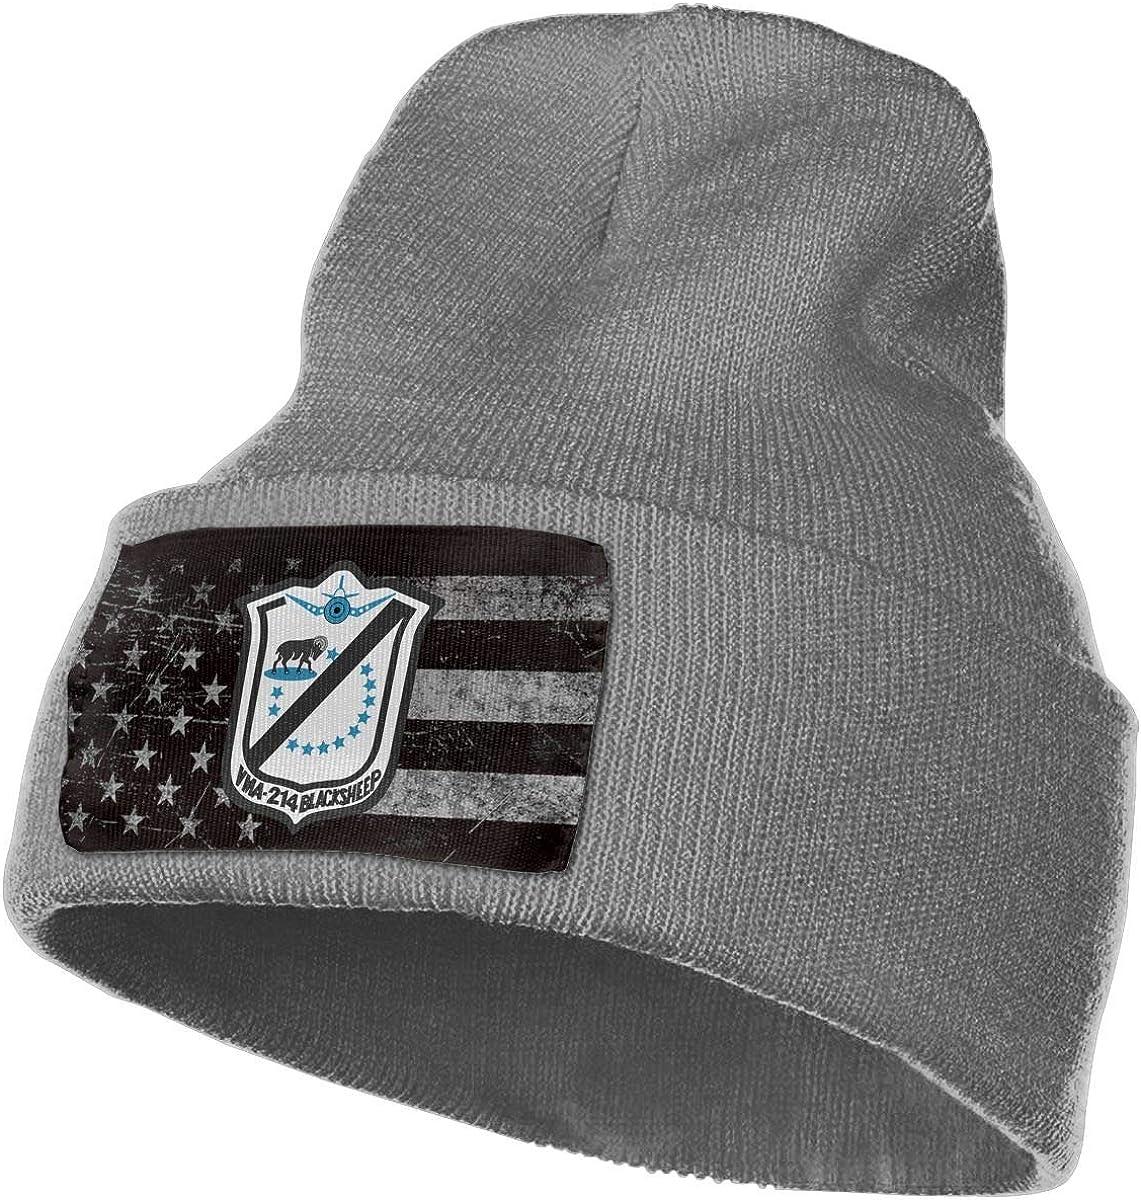 Peng Peng VMA-214 Insignia Beanie Cap Skull Cap Men Women Winter Warm Knitting Hats